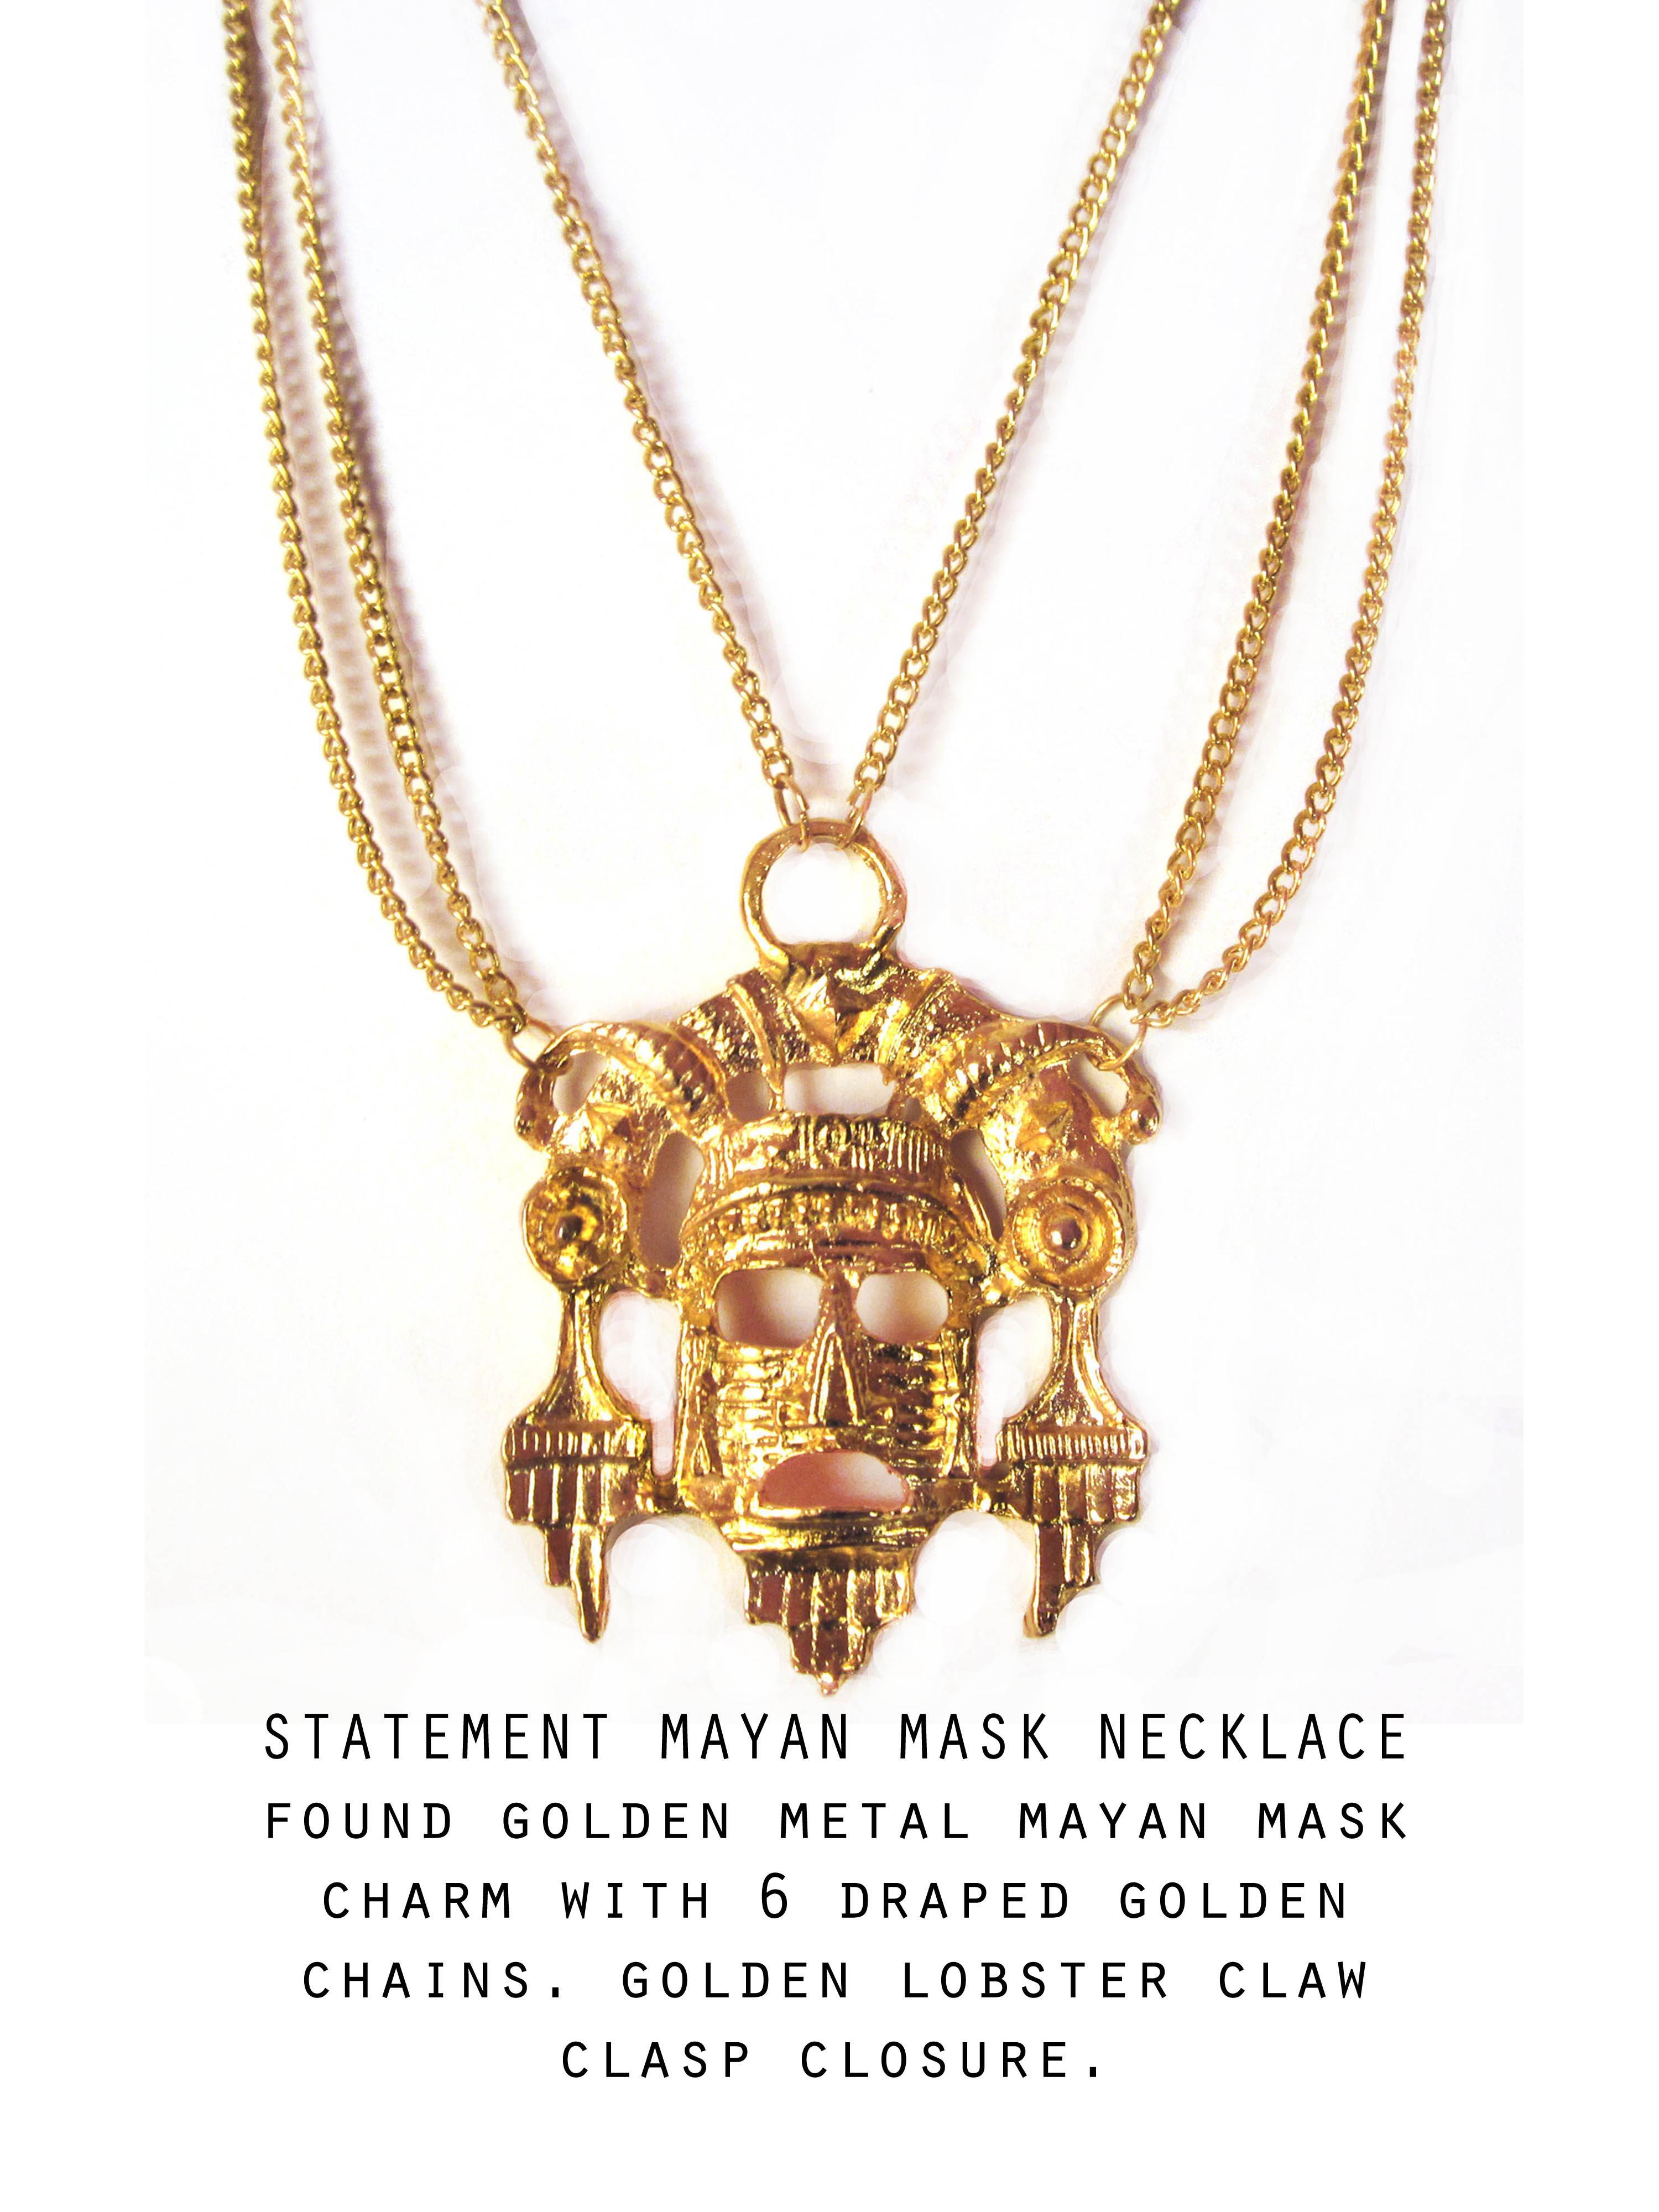 Mayan Mask Necklace